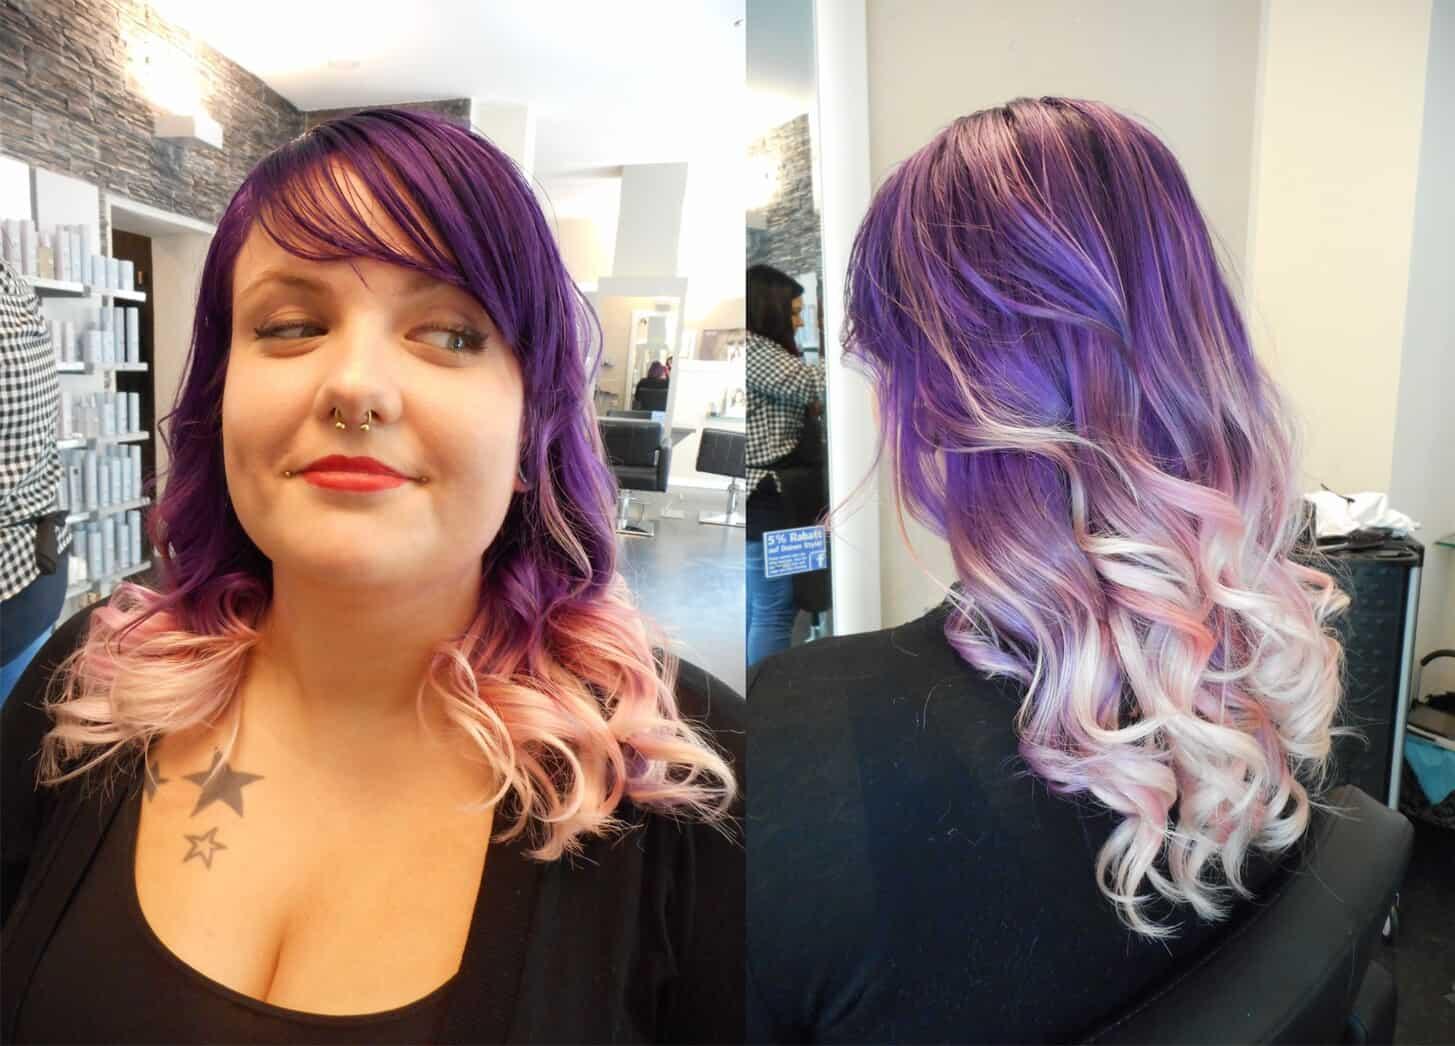 Juliane-Napiontek-mit-neuer-Haarfarbe